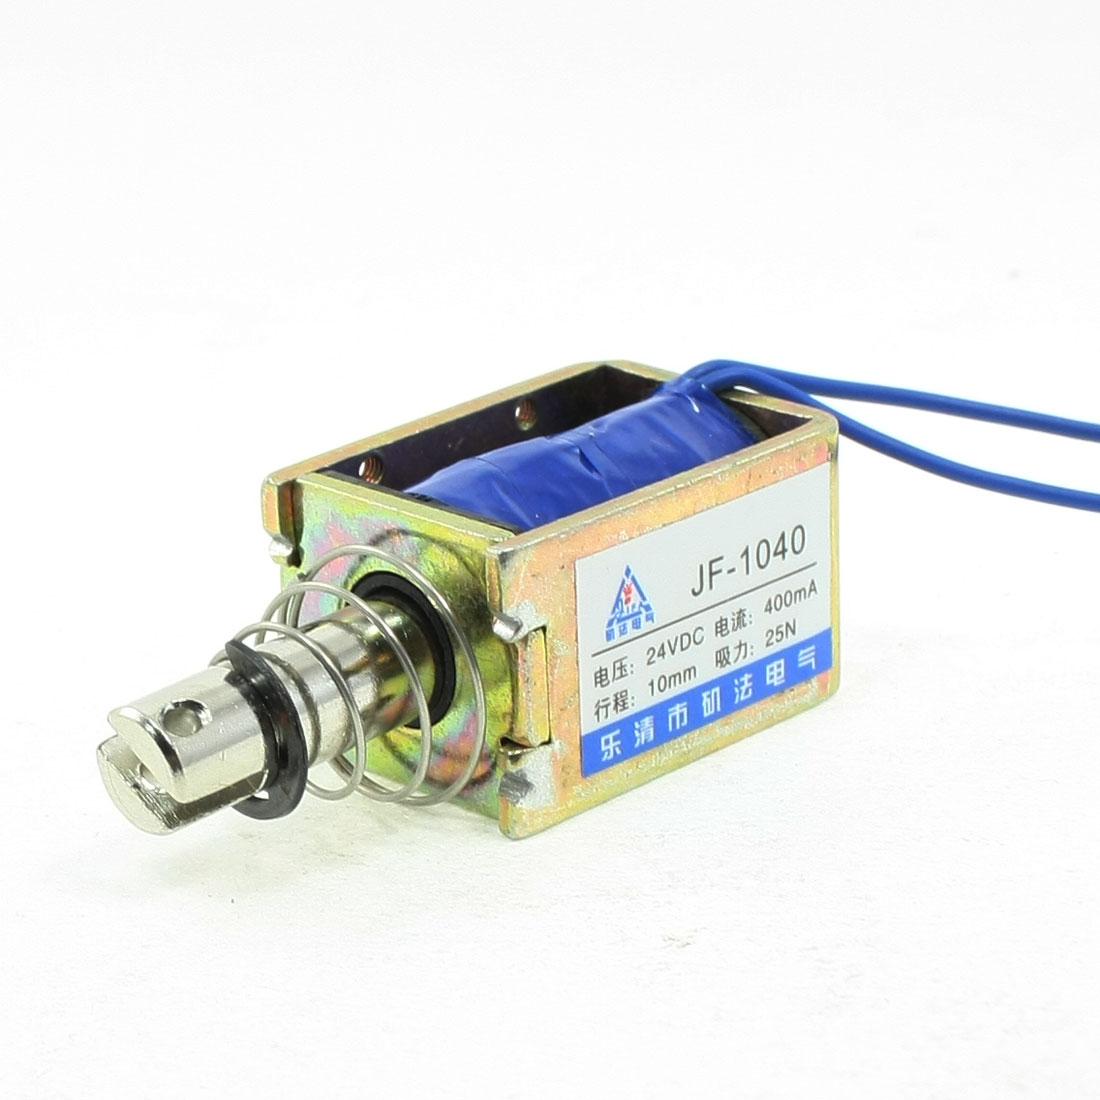 DC 24V 400mA Push Pull Type Open Frame Solenoid Electromagnet 10mm 25N 5.5LB